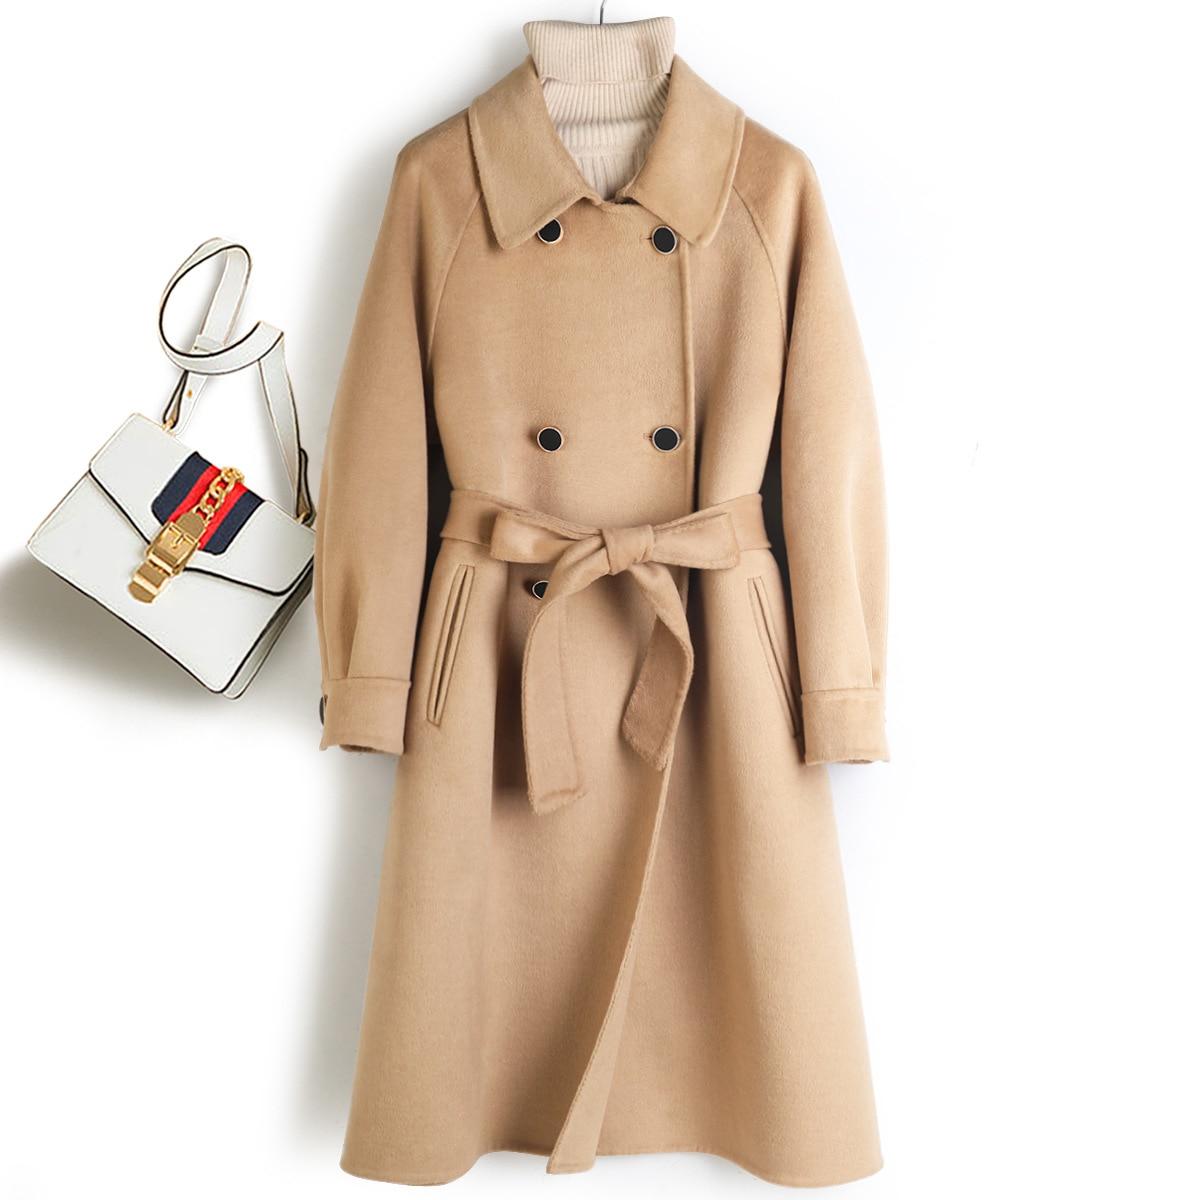 Abrigo de invierno de 90% Lana, cintura ajustable coreana, doble botonadura, bolsillos,...